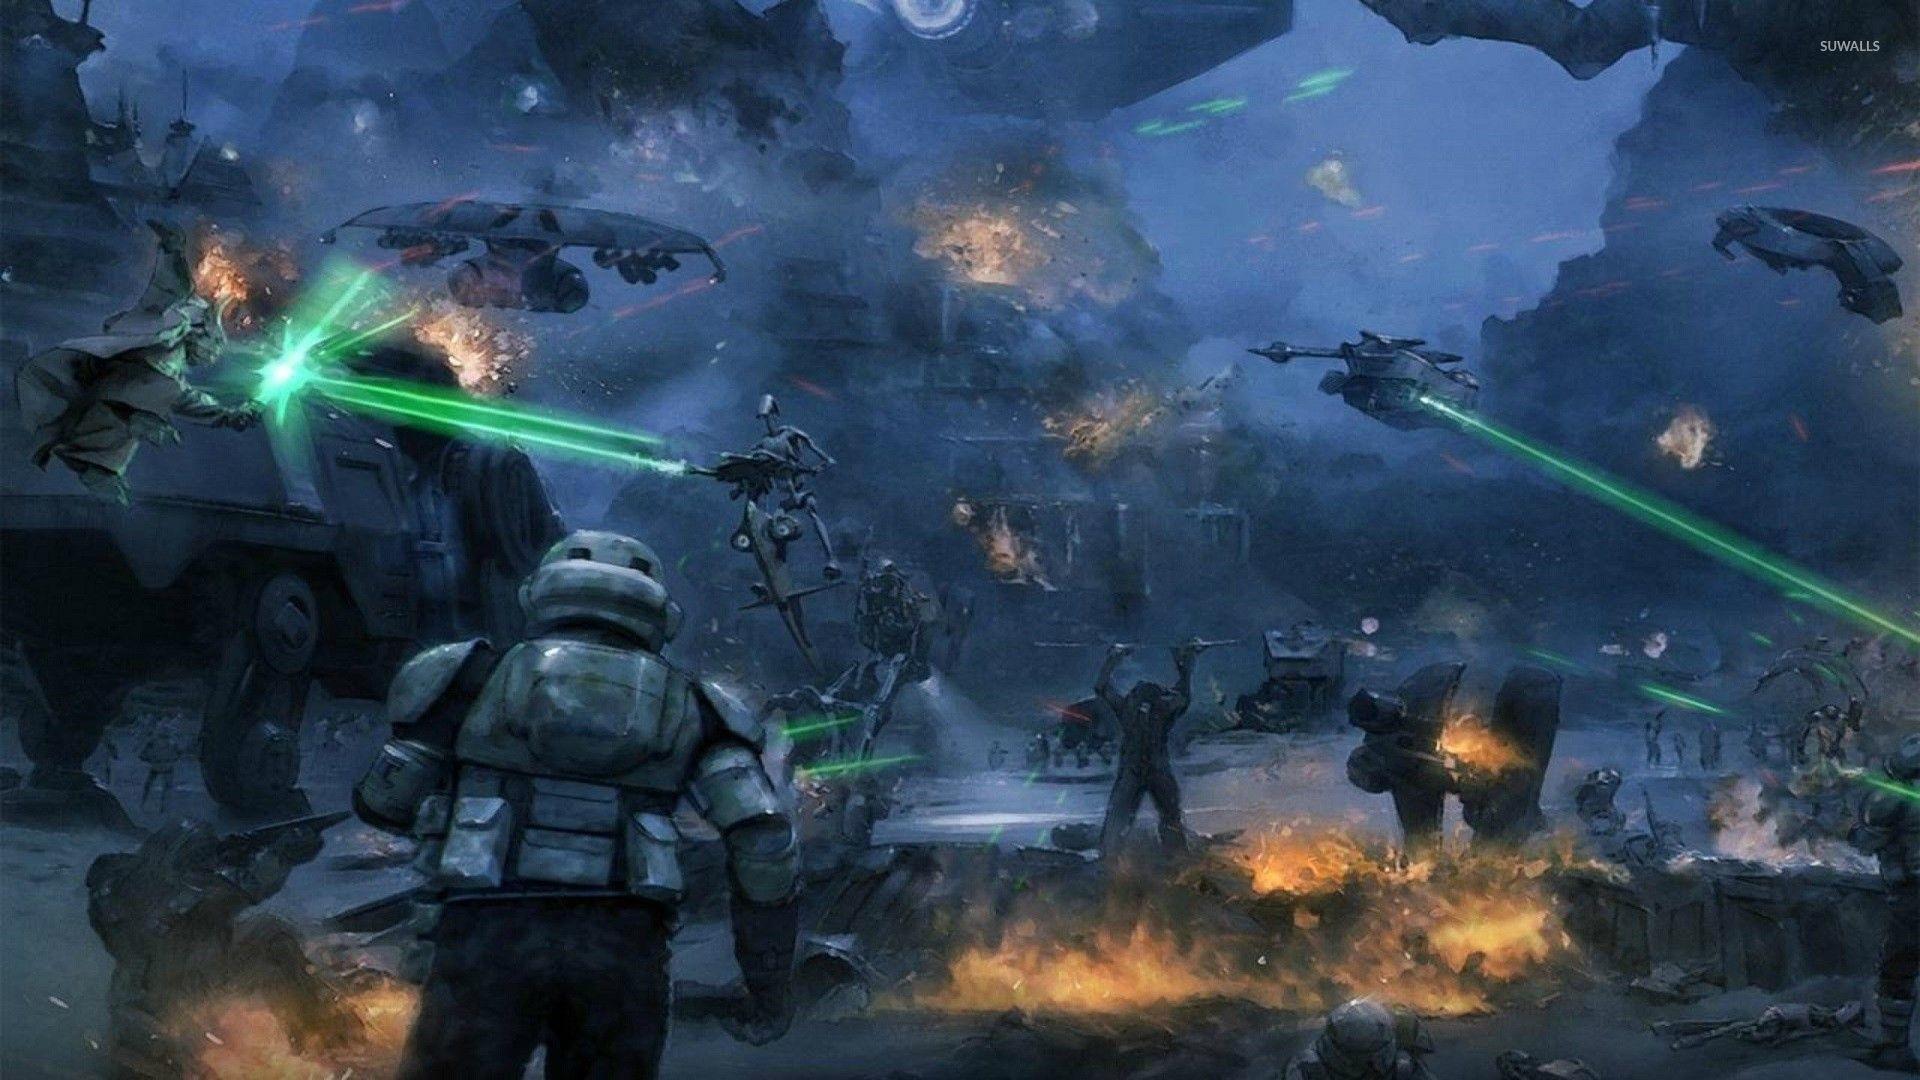 Star Wars Space Battle Wallpaper (61+ images)